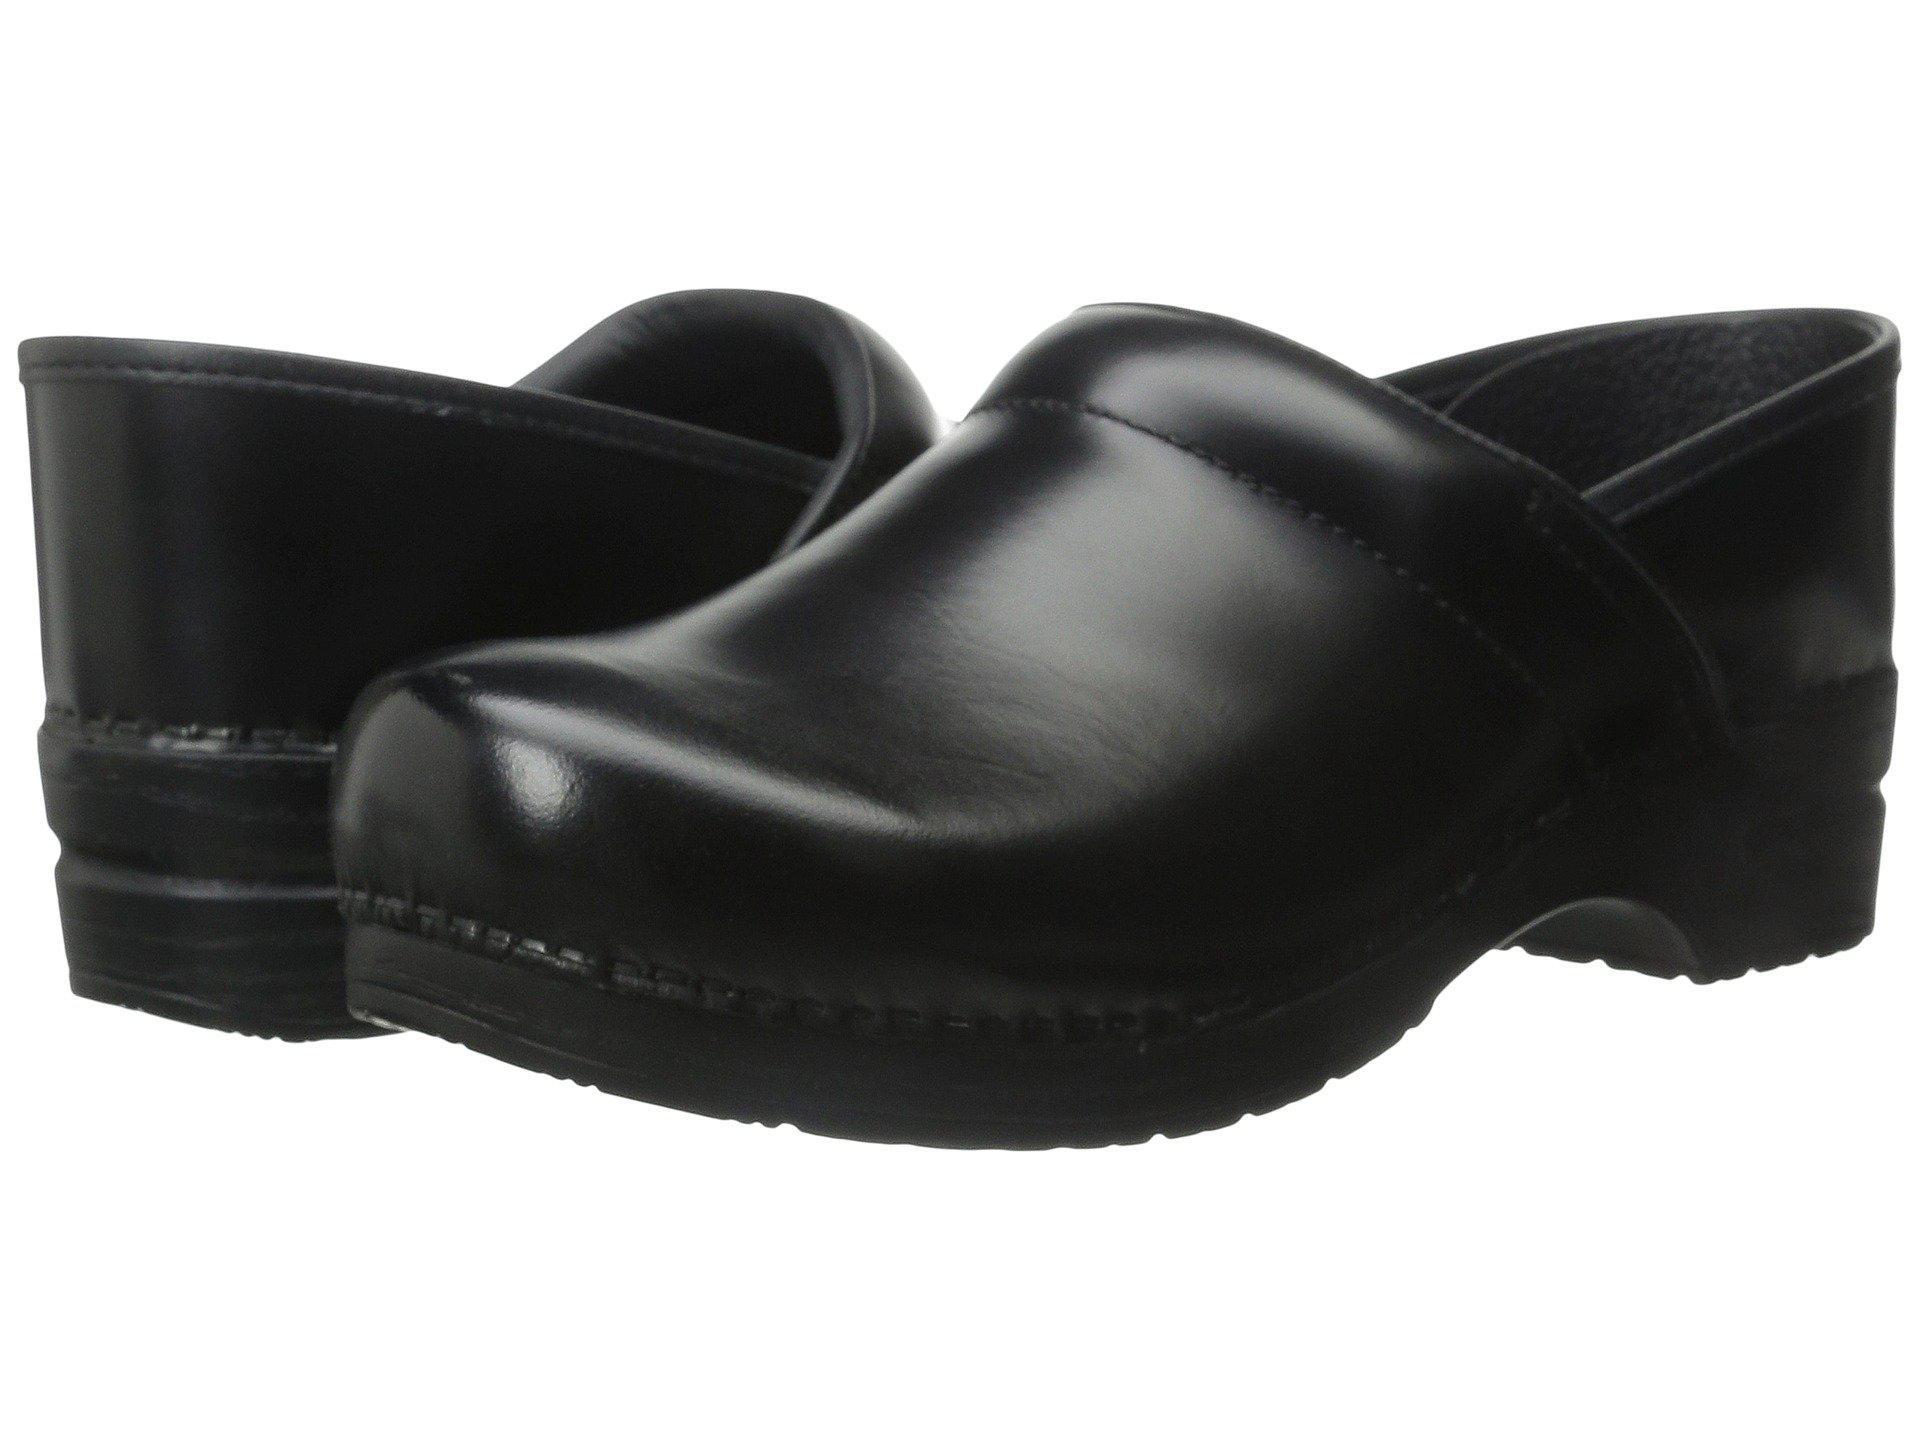 825949d9face3 dansko clogs men Lyst - Dansko Professional (antique Brown Oiled Leather)  Men's Clog .